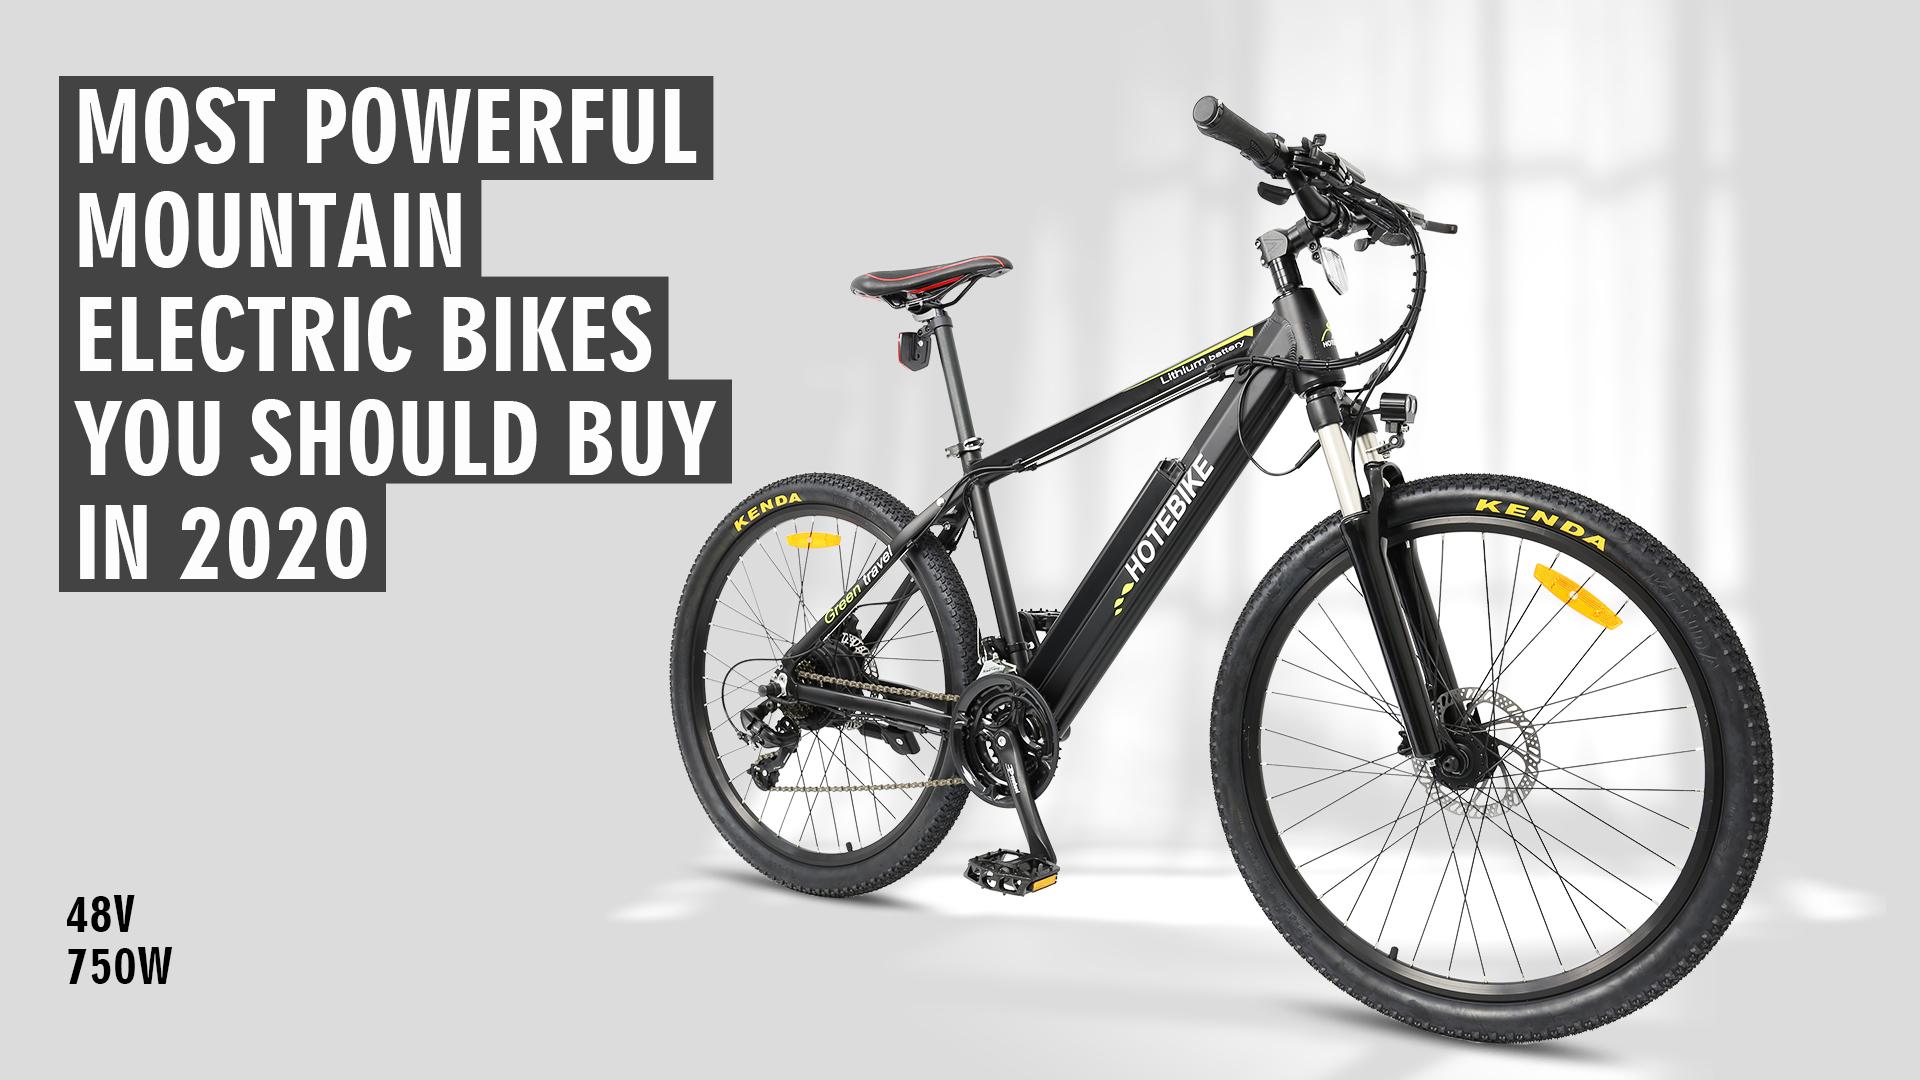 500W Mountain Bike with MTB Stem Adjustable Handlebar for 160cm to 188cm People